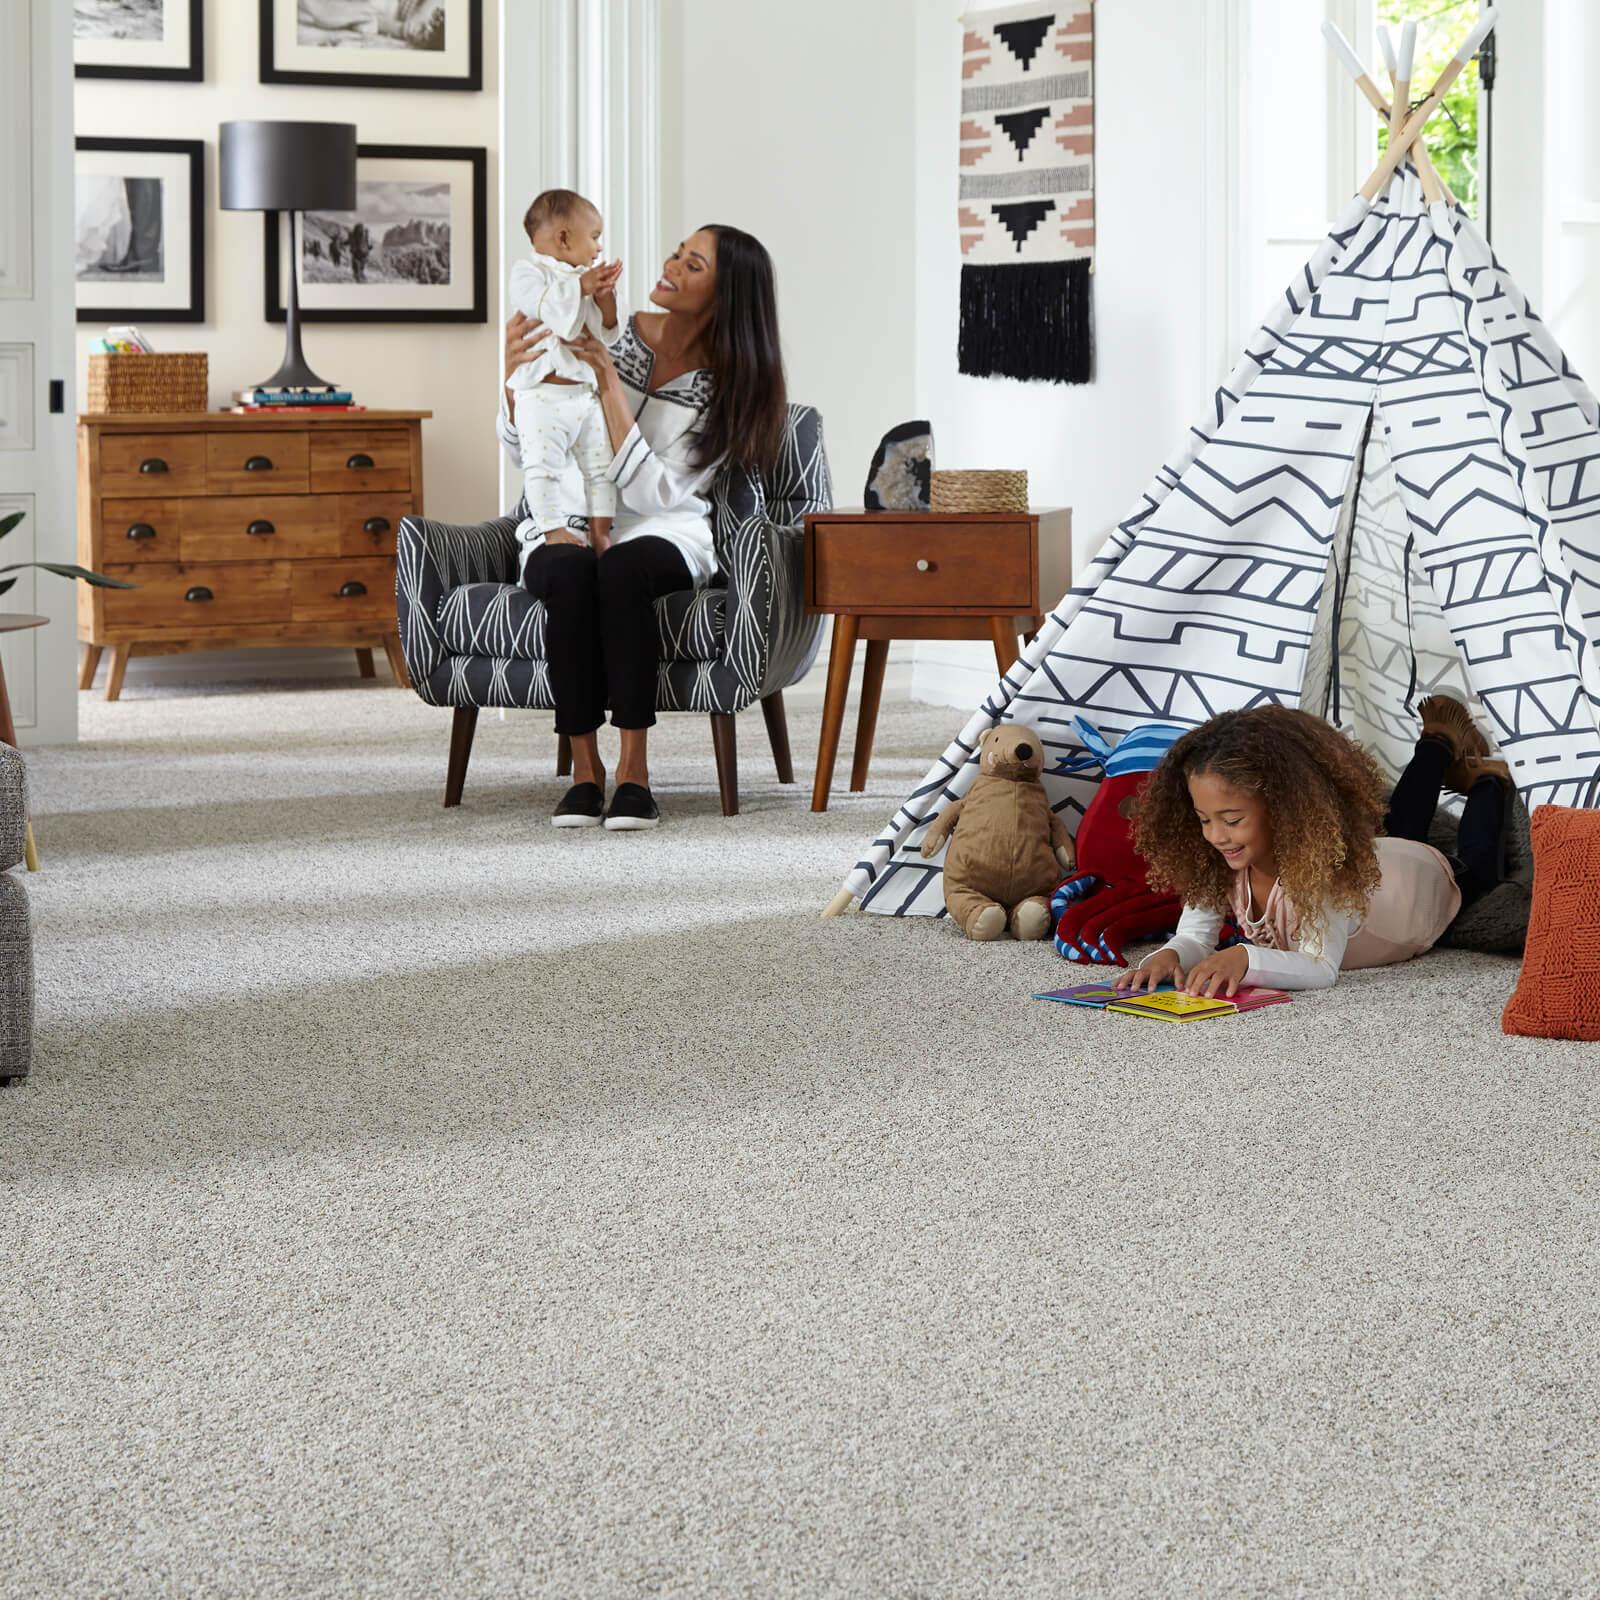 Carpet flooring | Birons Flooring Inc